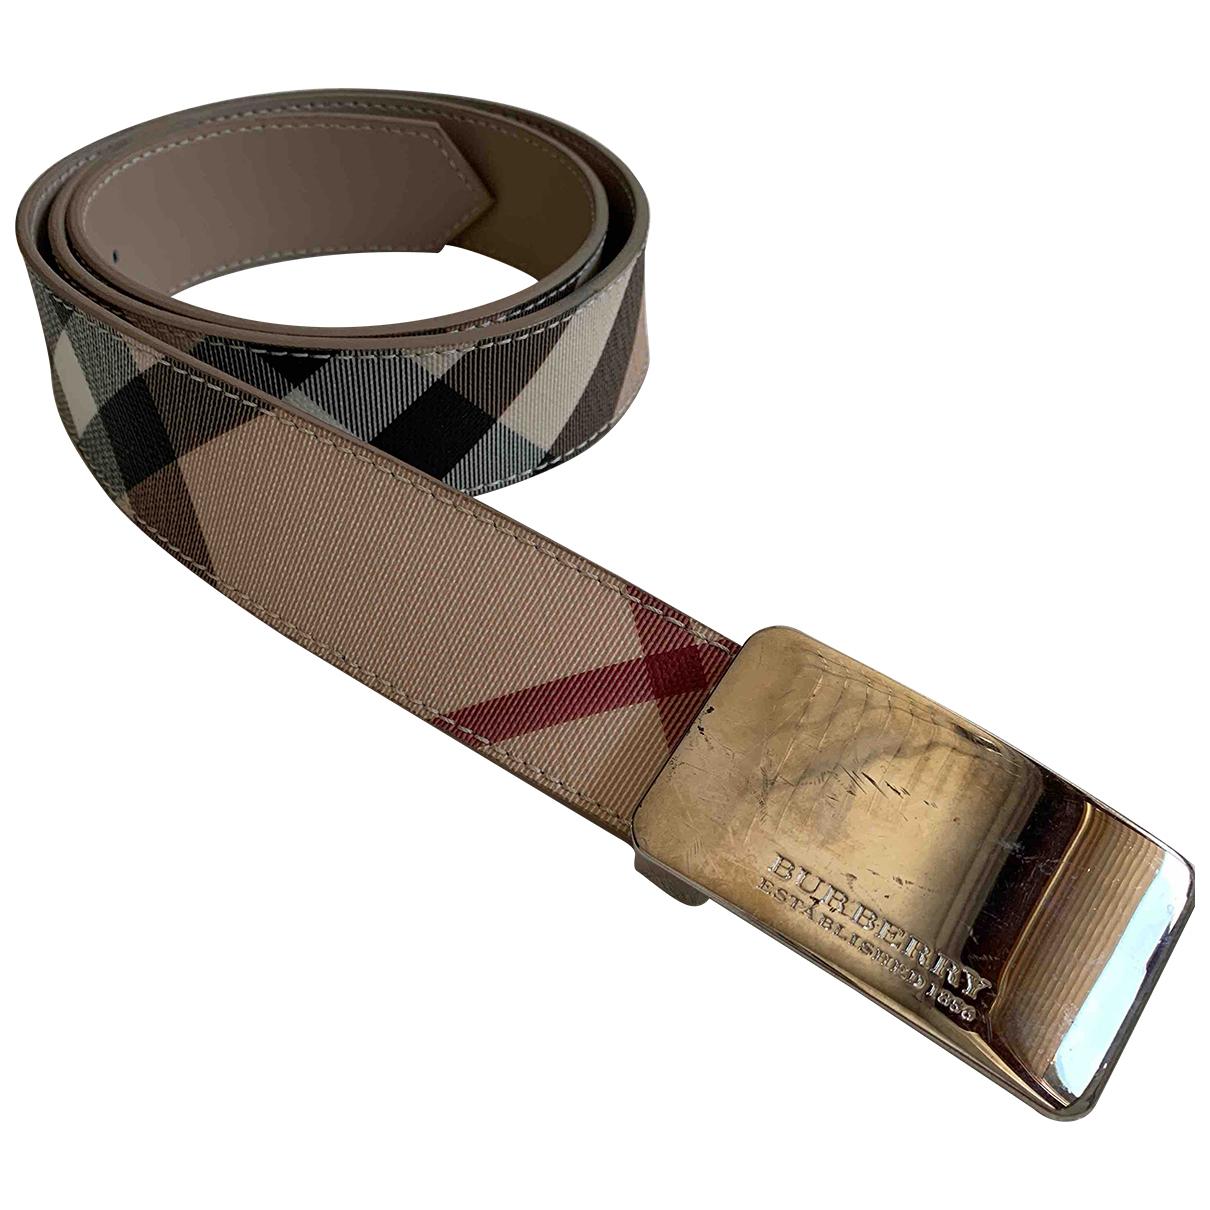 Burberry N Beige Leather belt for Women 95 cm